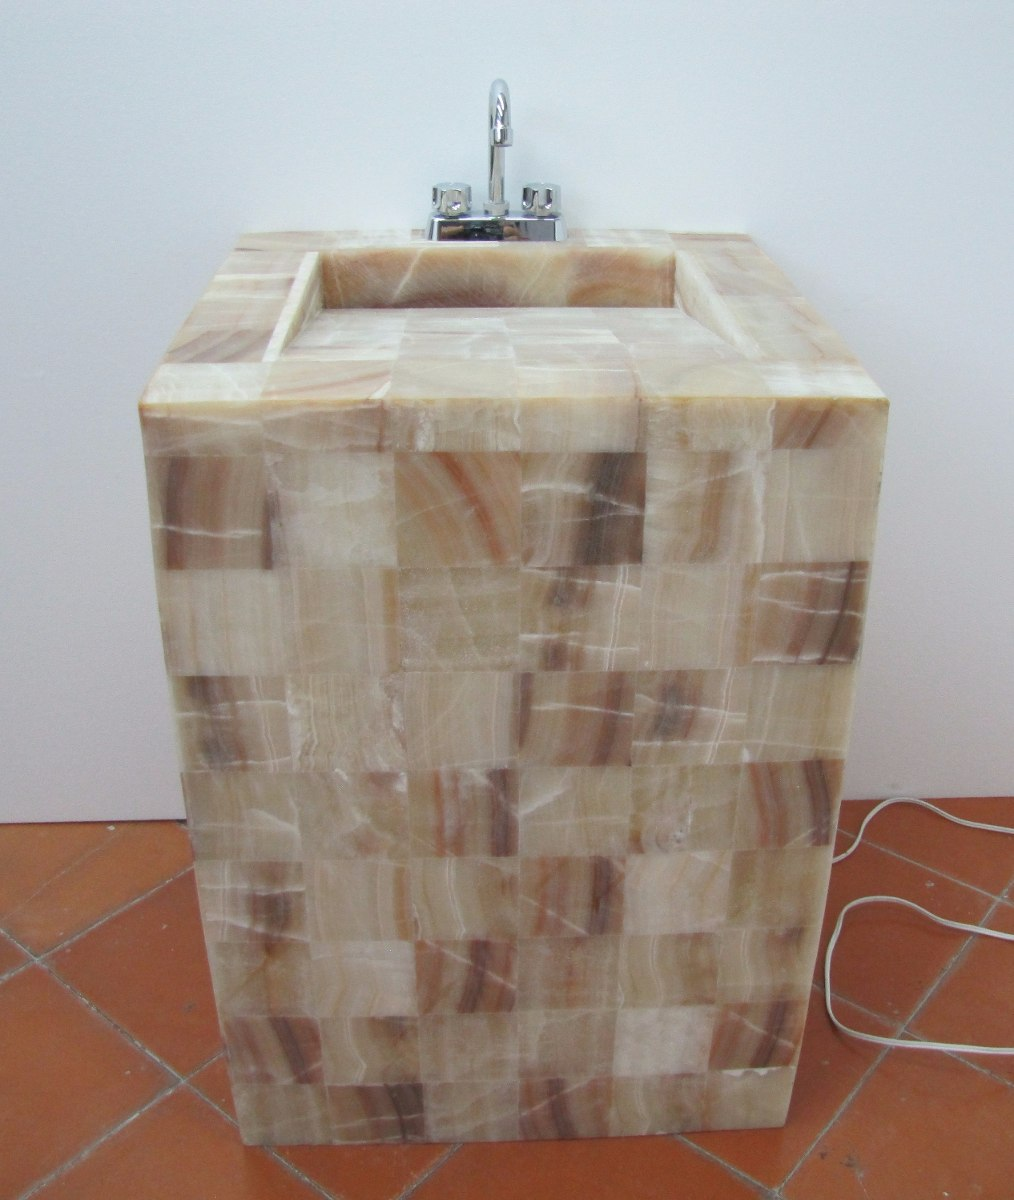 Iluminacion Para Baños Mercado Libre:lavabo de onix de 60 x 50 x 85 cmde alt con iluminación